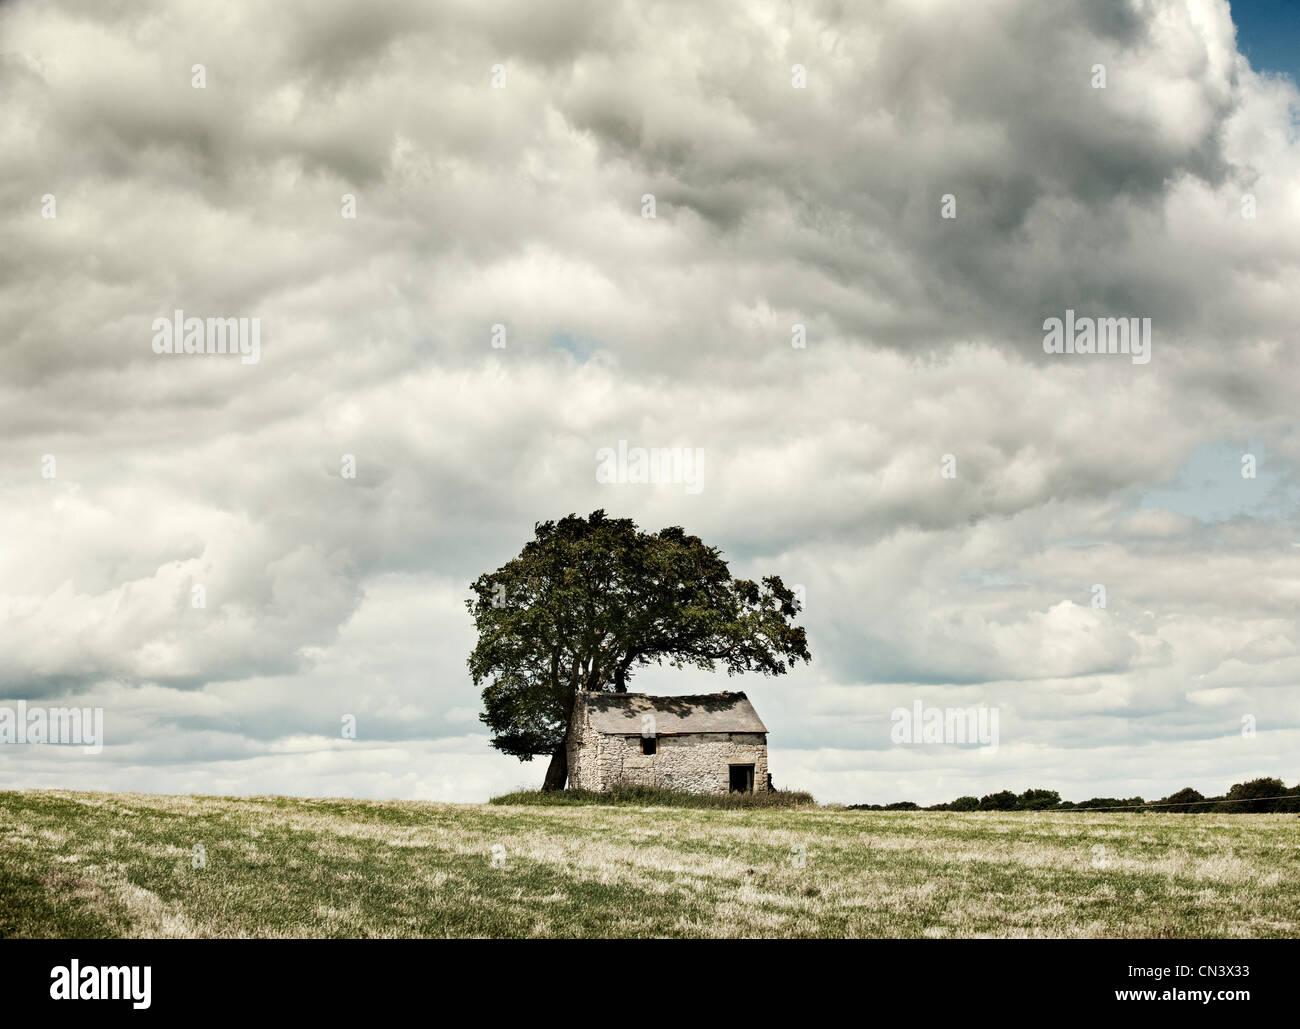 Barn in a field - Stock Image